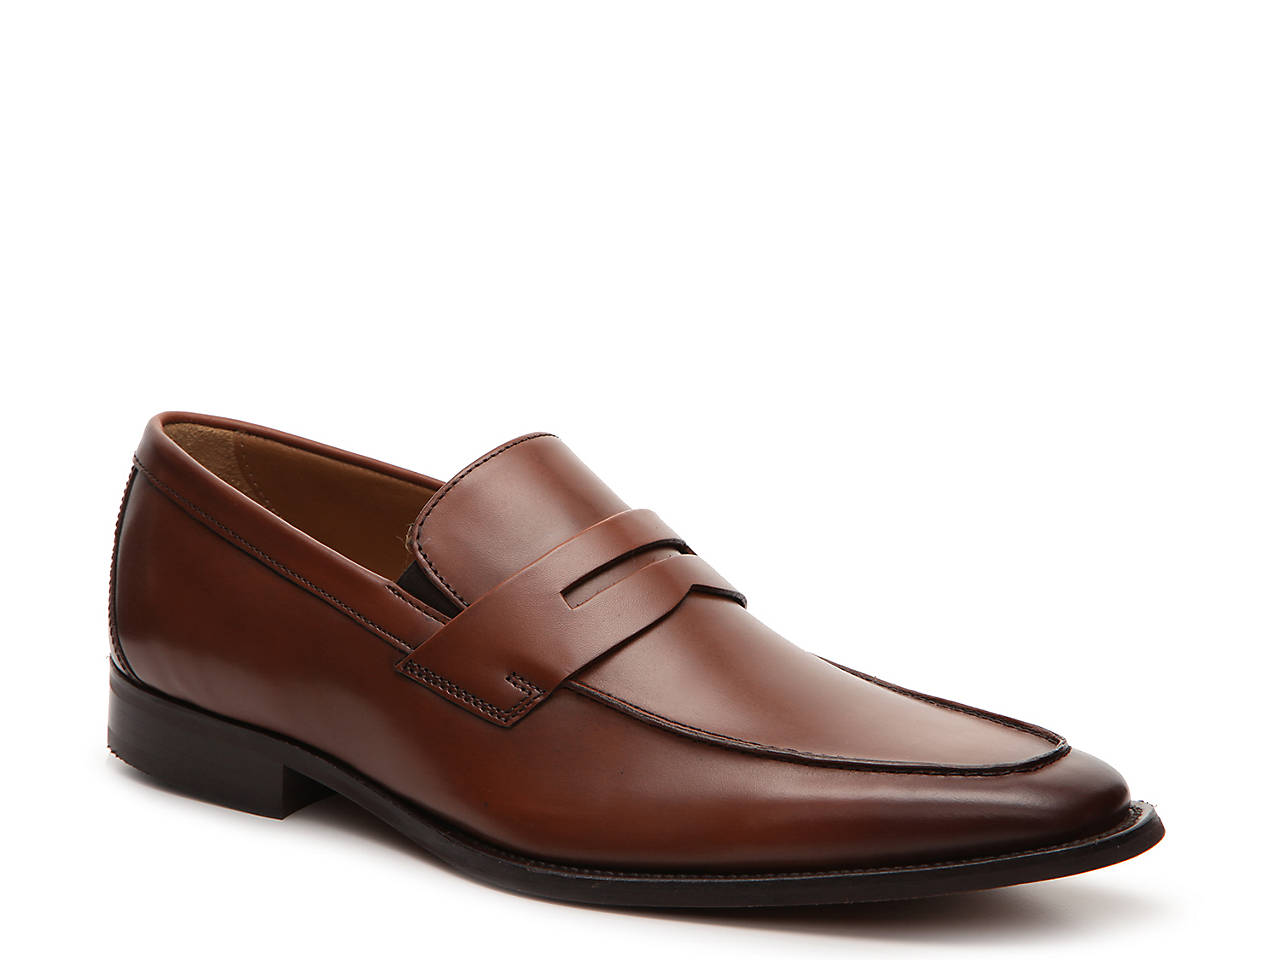 Florsheim Sabato Penny Slip On Loafers gSNZefl4S